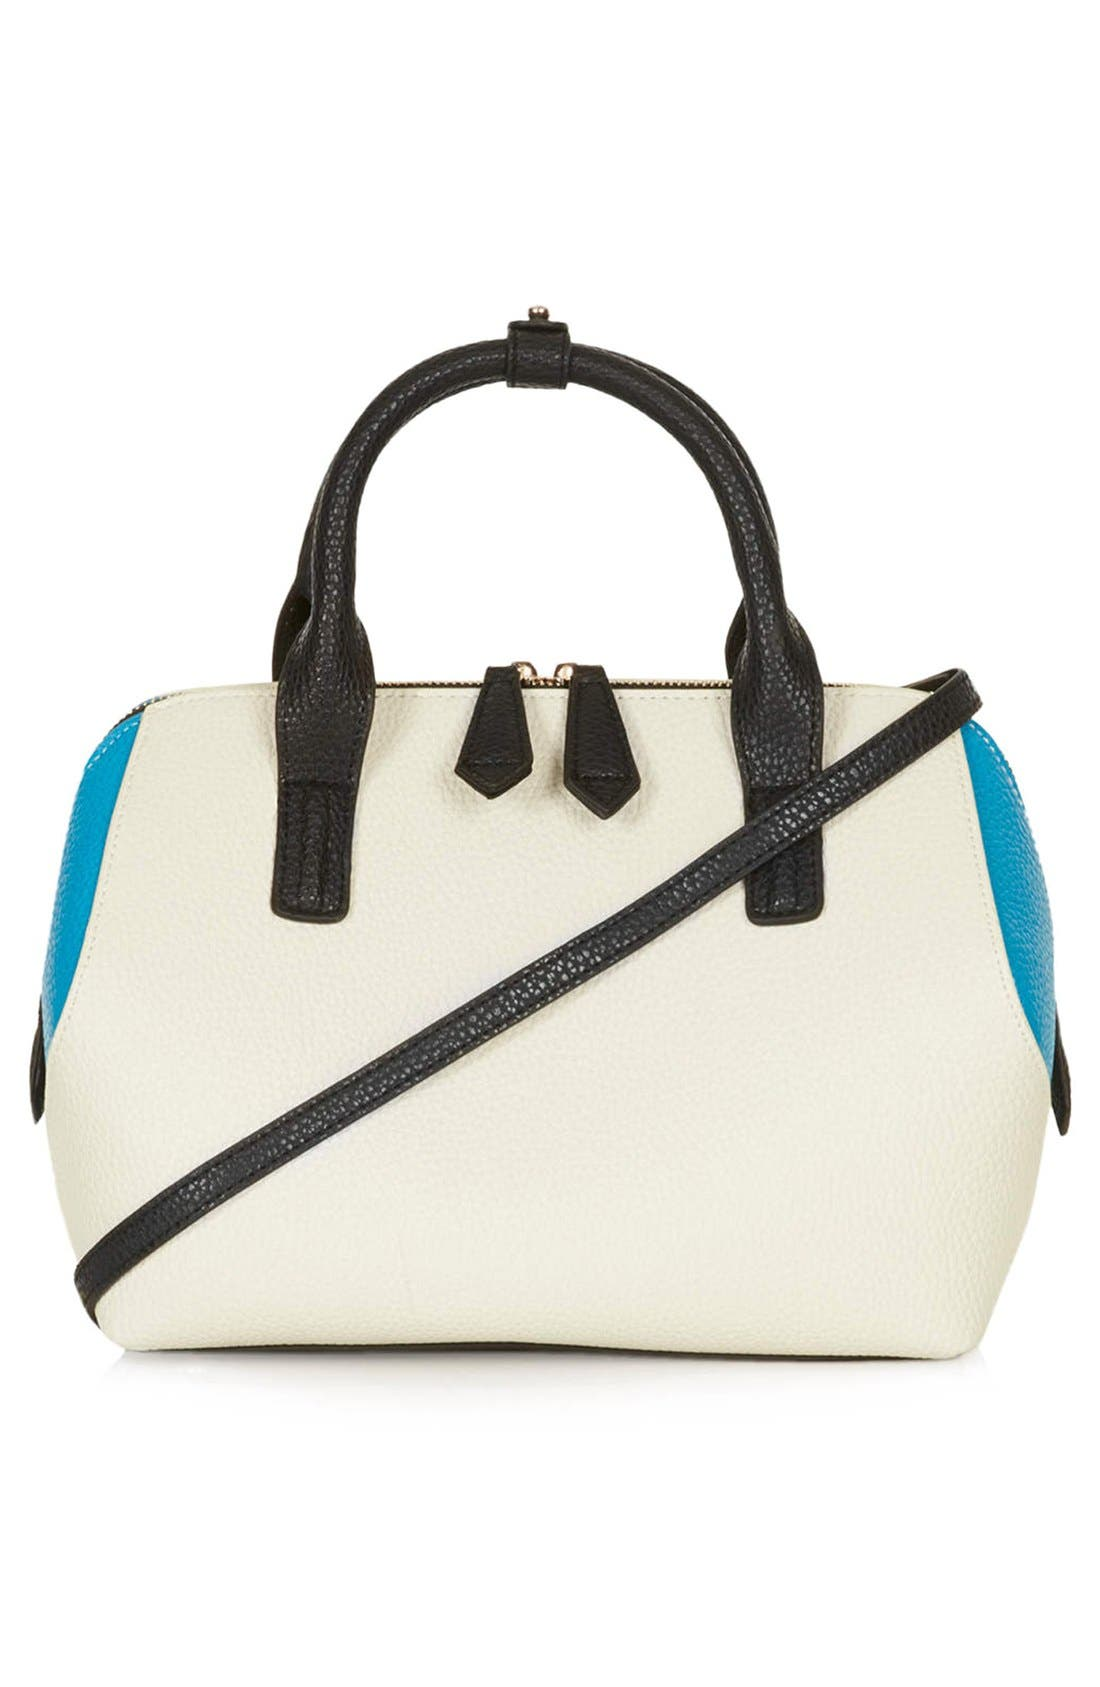 Alternate Image 1 Selected - Topshop Colorblock Mini Holdall Bag